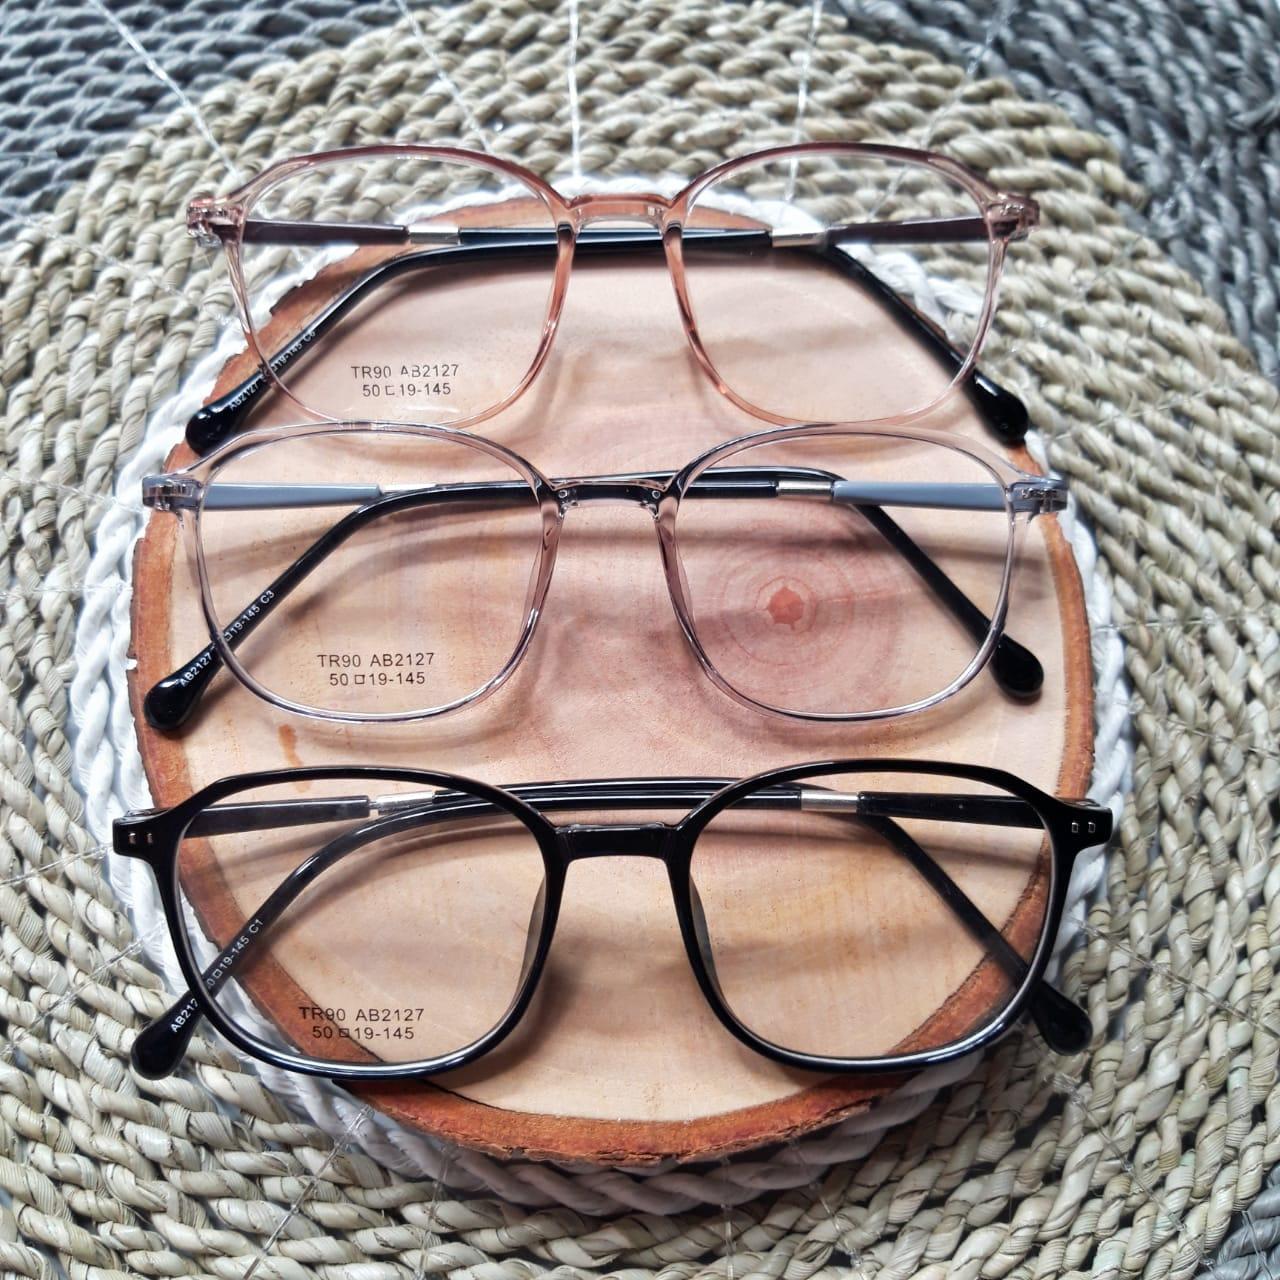 Kacamata Elegan Seri F 2127 Harga 100K